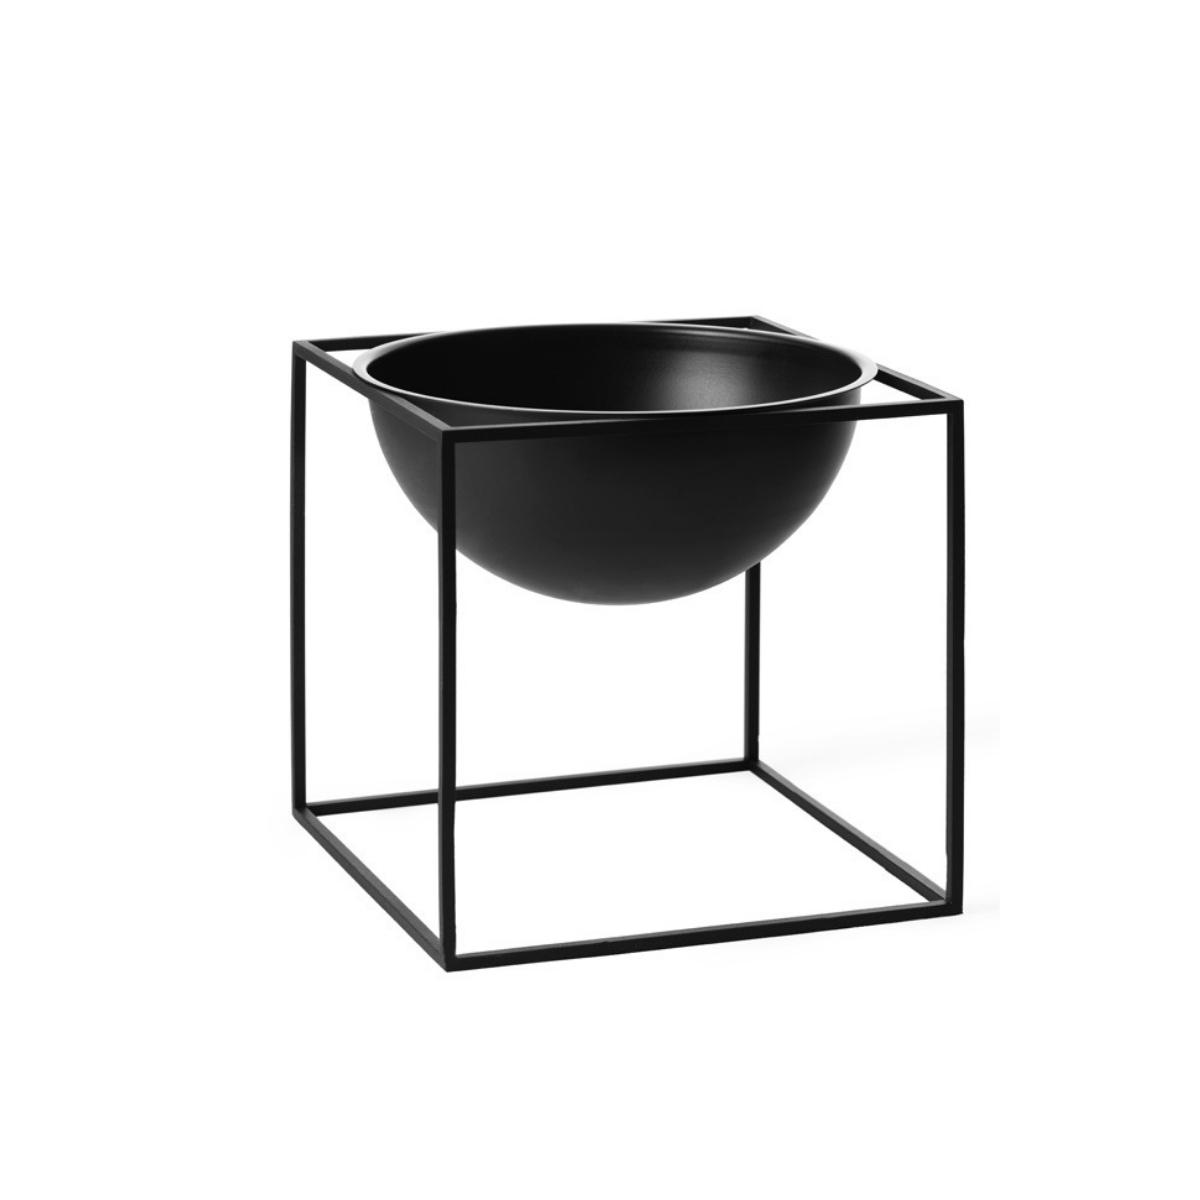 By Lassen   Kubus Bowl - Large - Bolighuset Werenberg